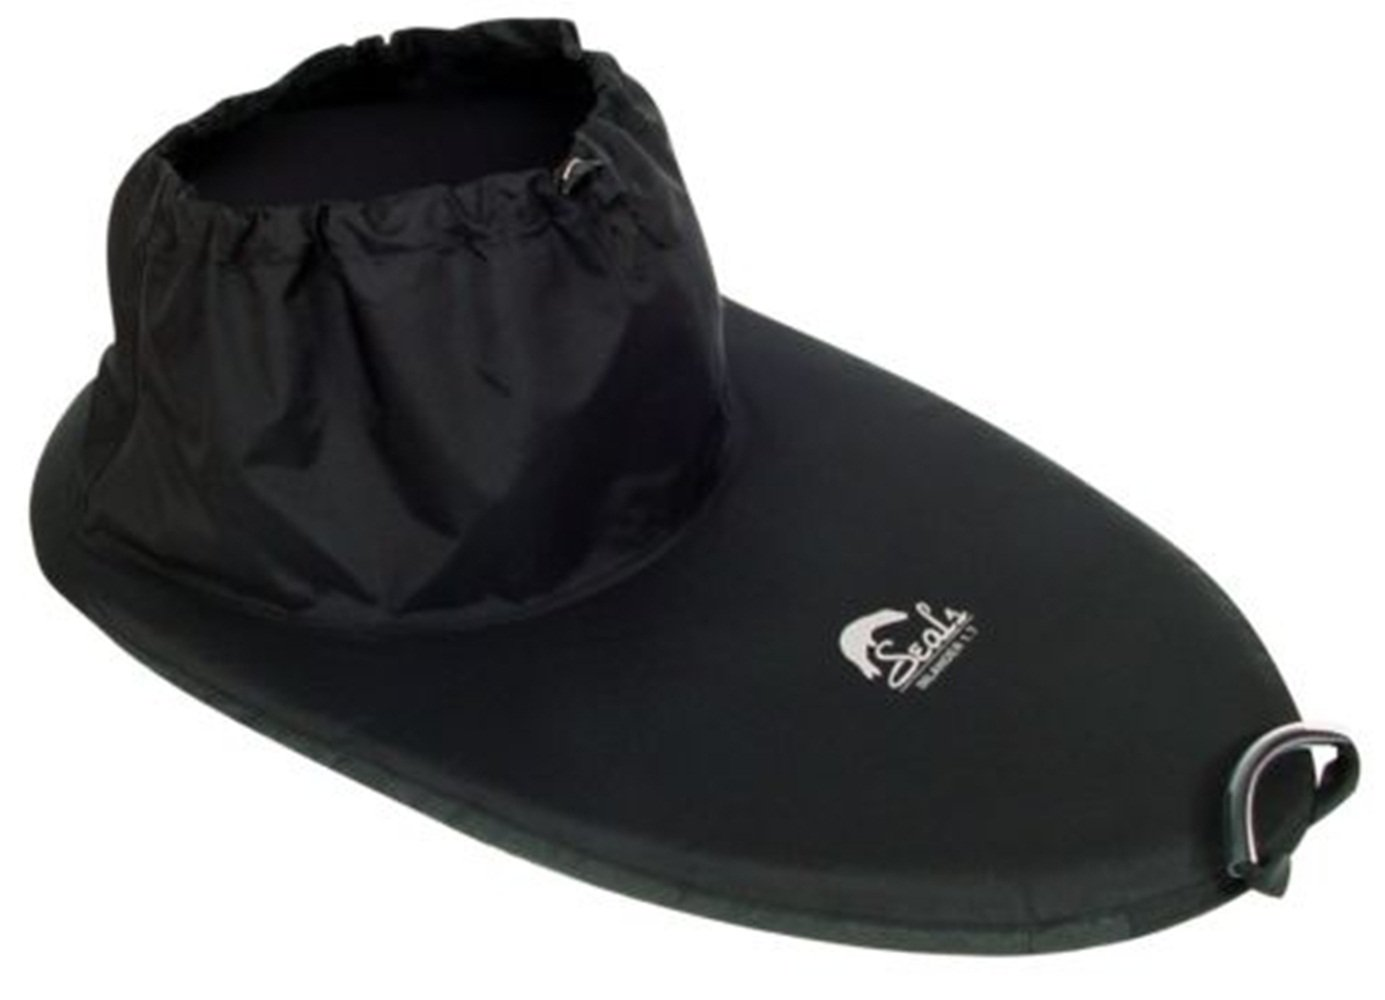 Kayak Spray Skirt 2.2 Seals Inlander Nylon Black kayak accessories spray skirt